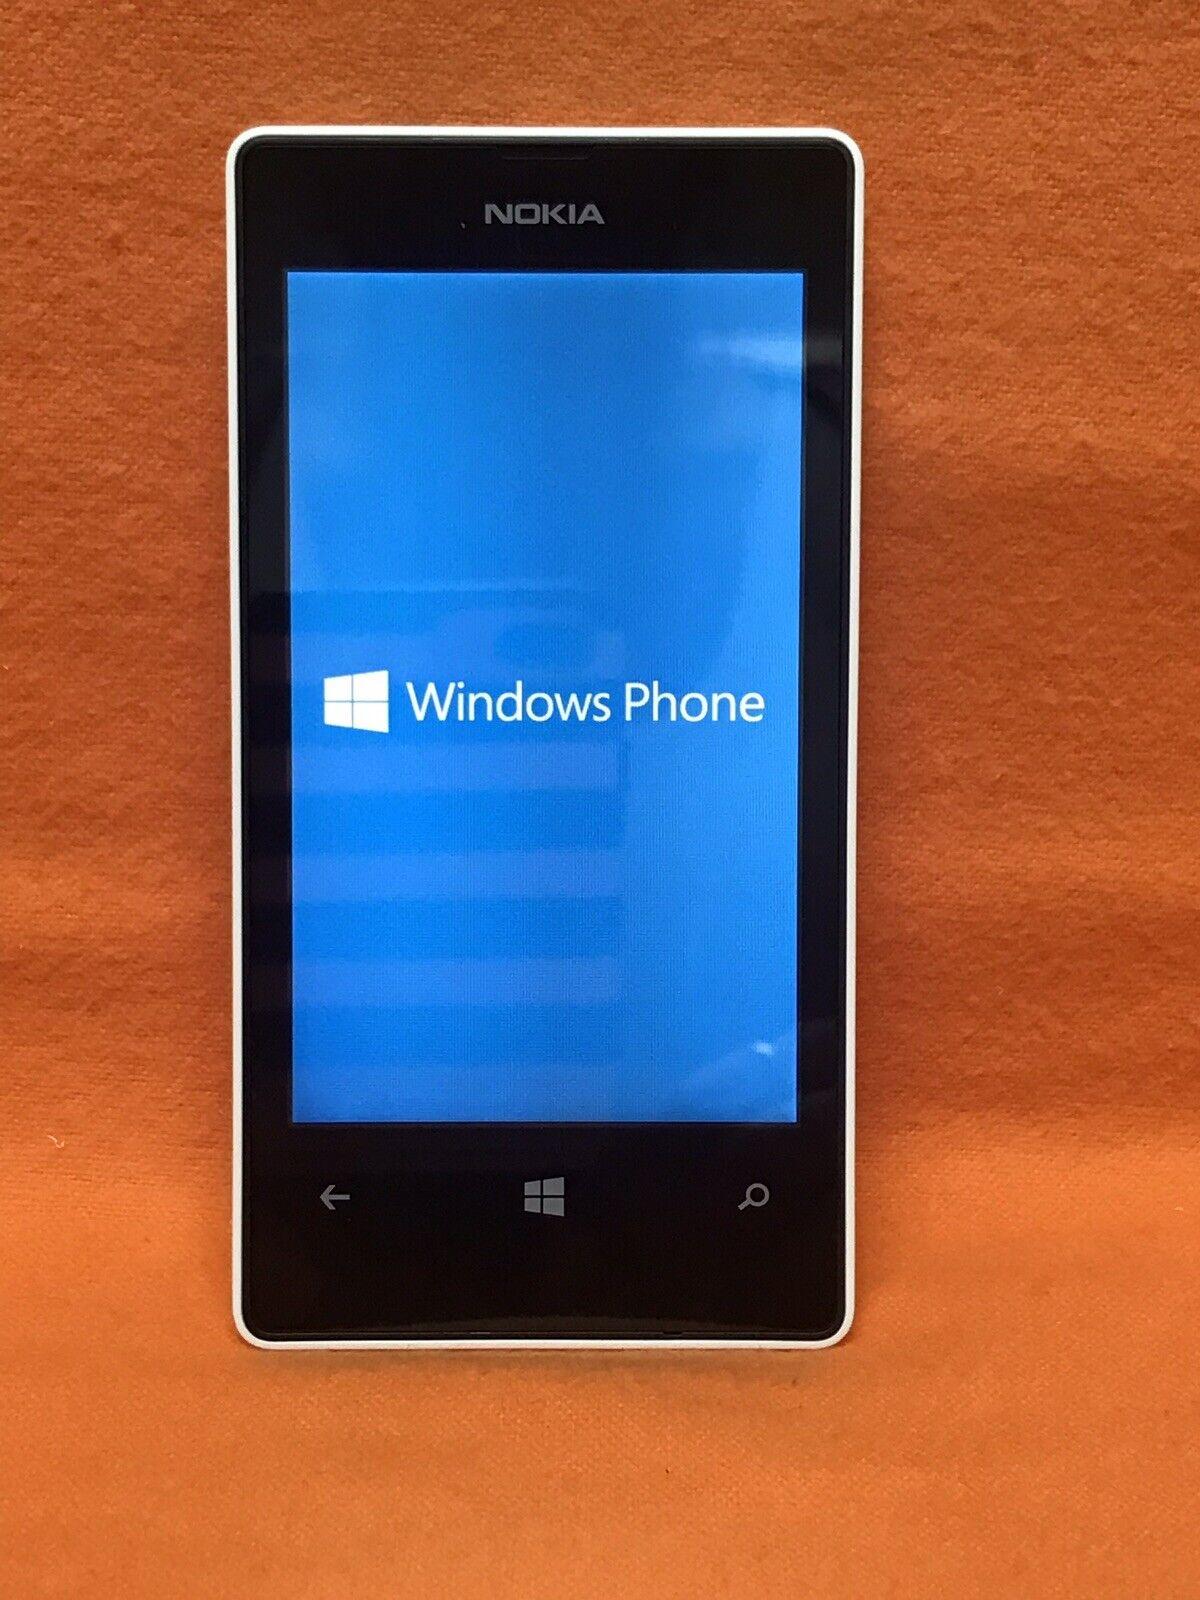 Nokia Lumia 521 - 8 GB - White (T-Mobile) Smartphone